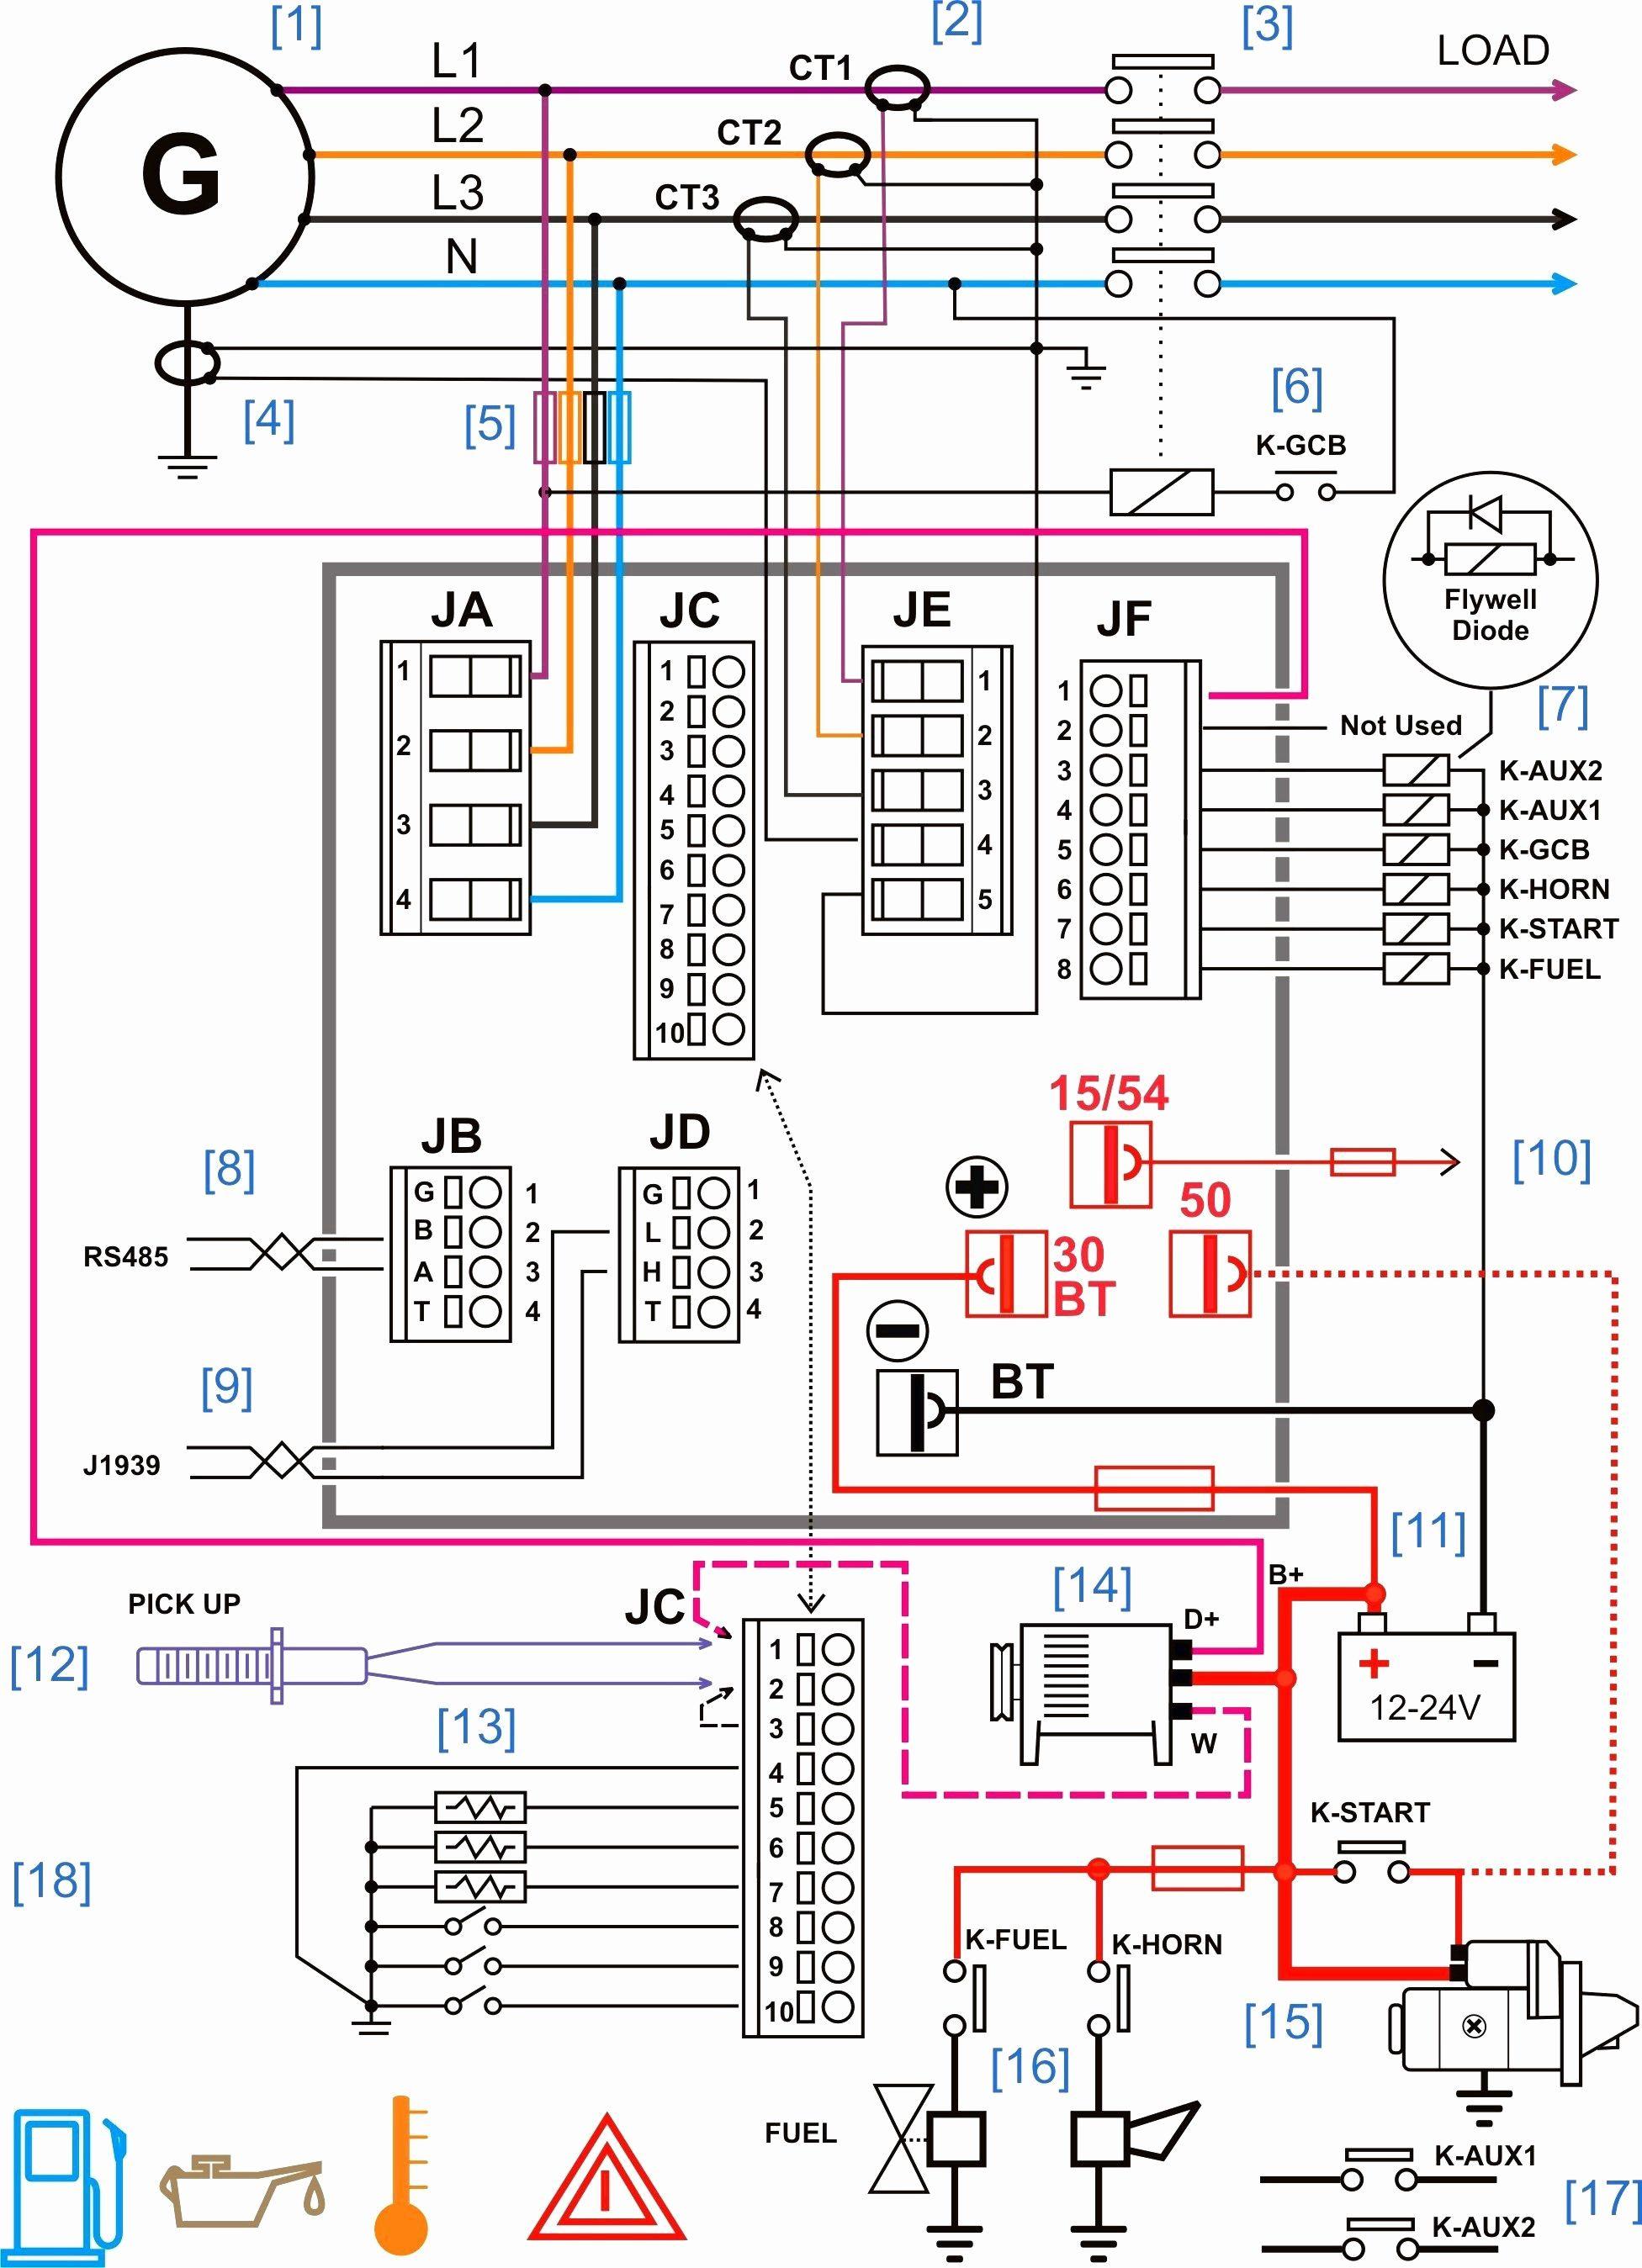 Bulldog Security Vehicle Wiring Diagram Beautiful Bulldog Wiring - Bulldog Security Wiring Diagram